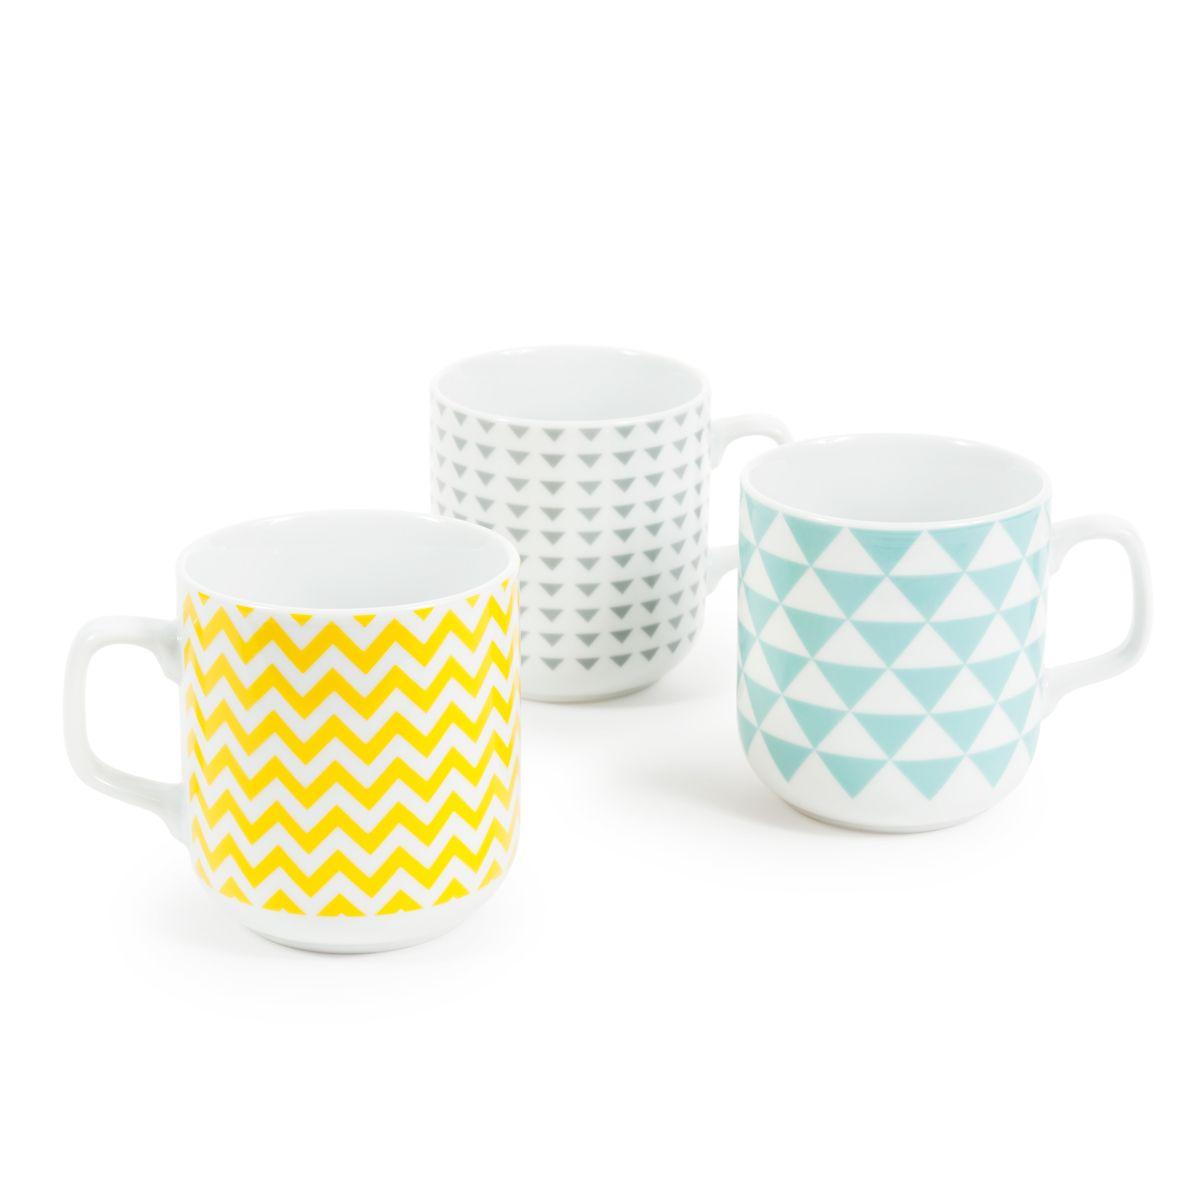 Mugs Copenhagen Maison Du Monde Mugs Porcelain Ceramics